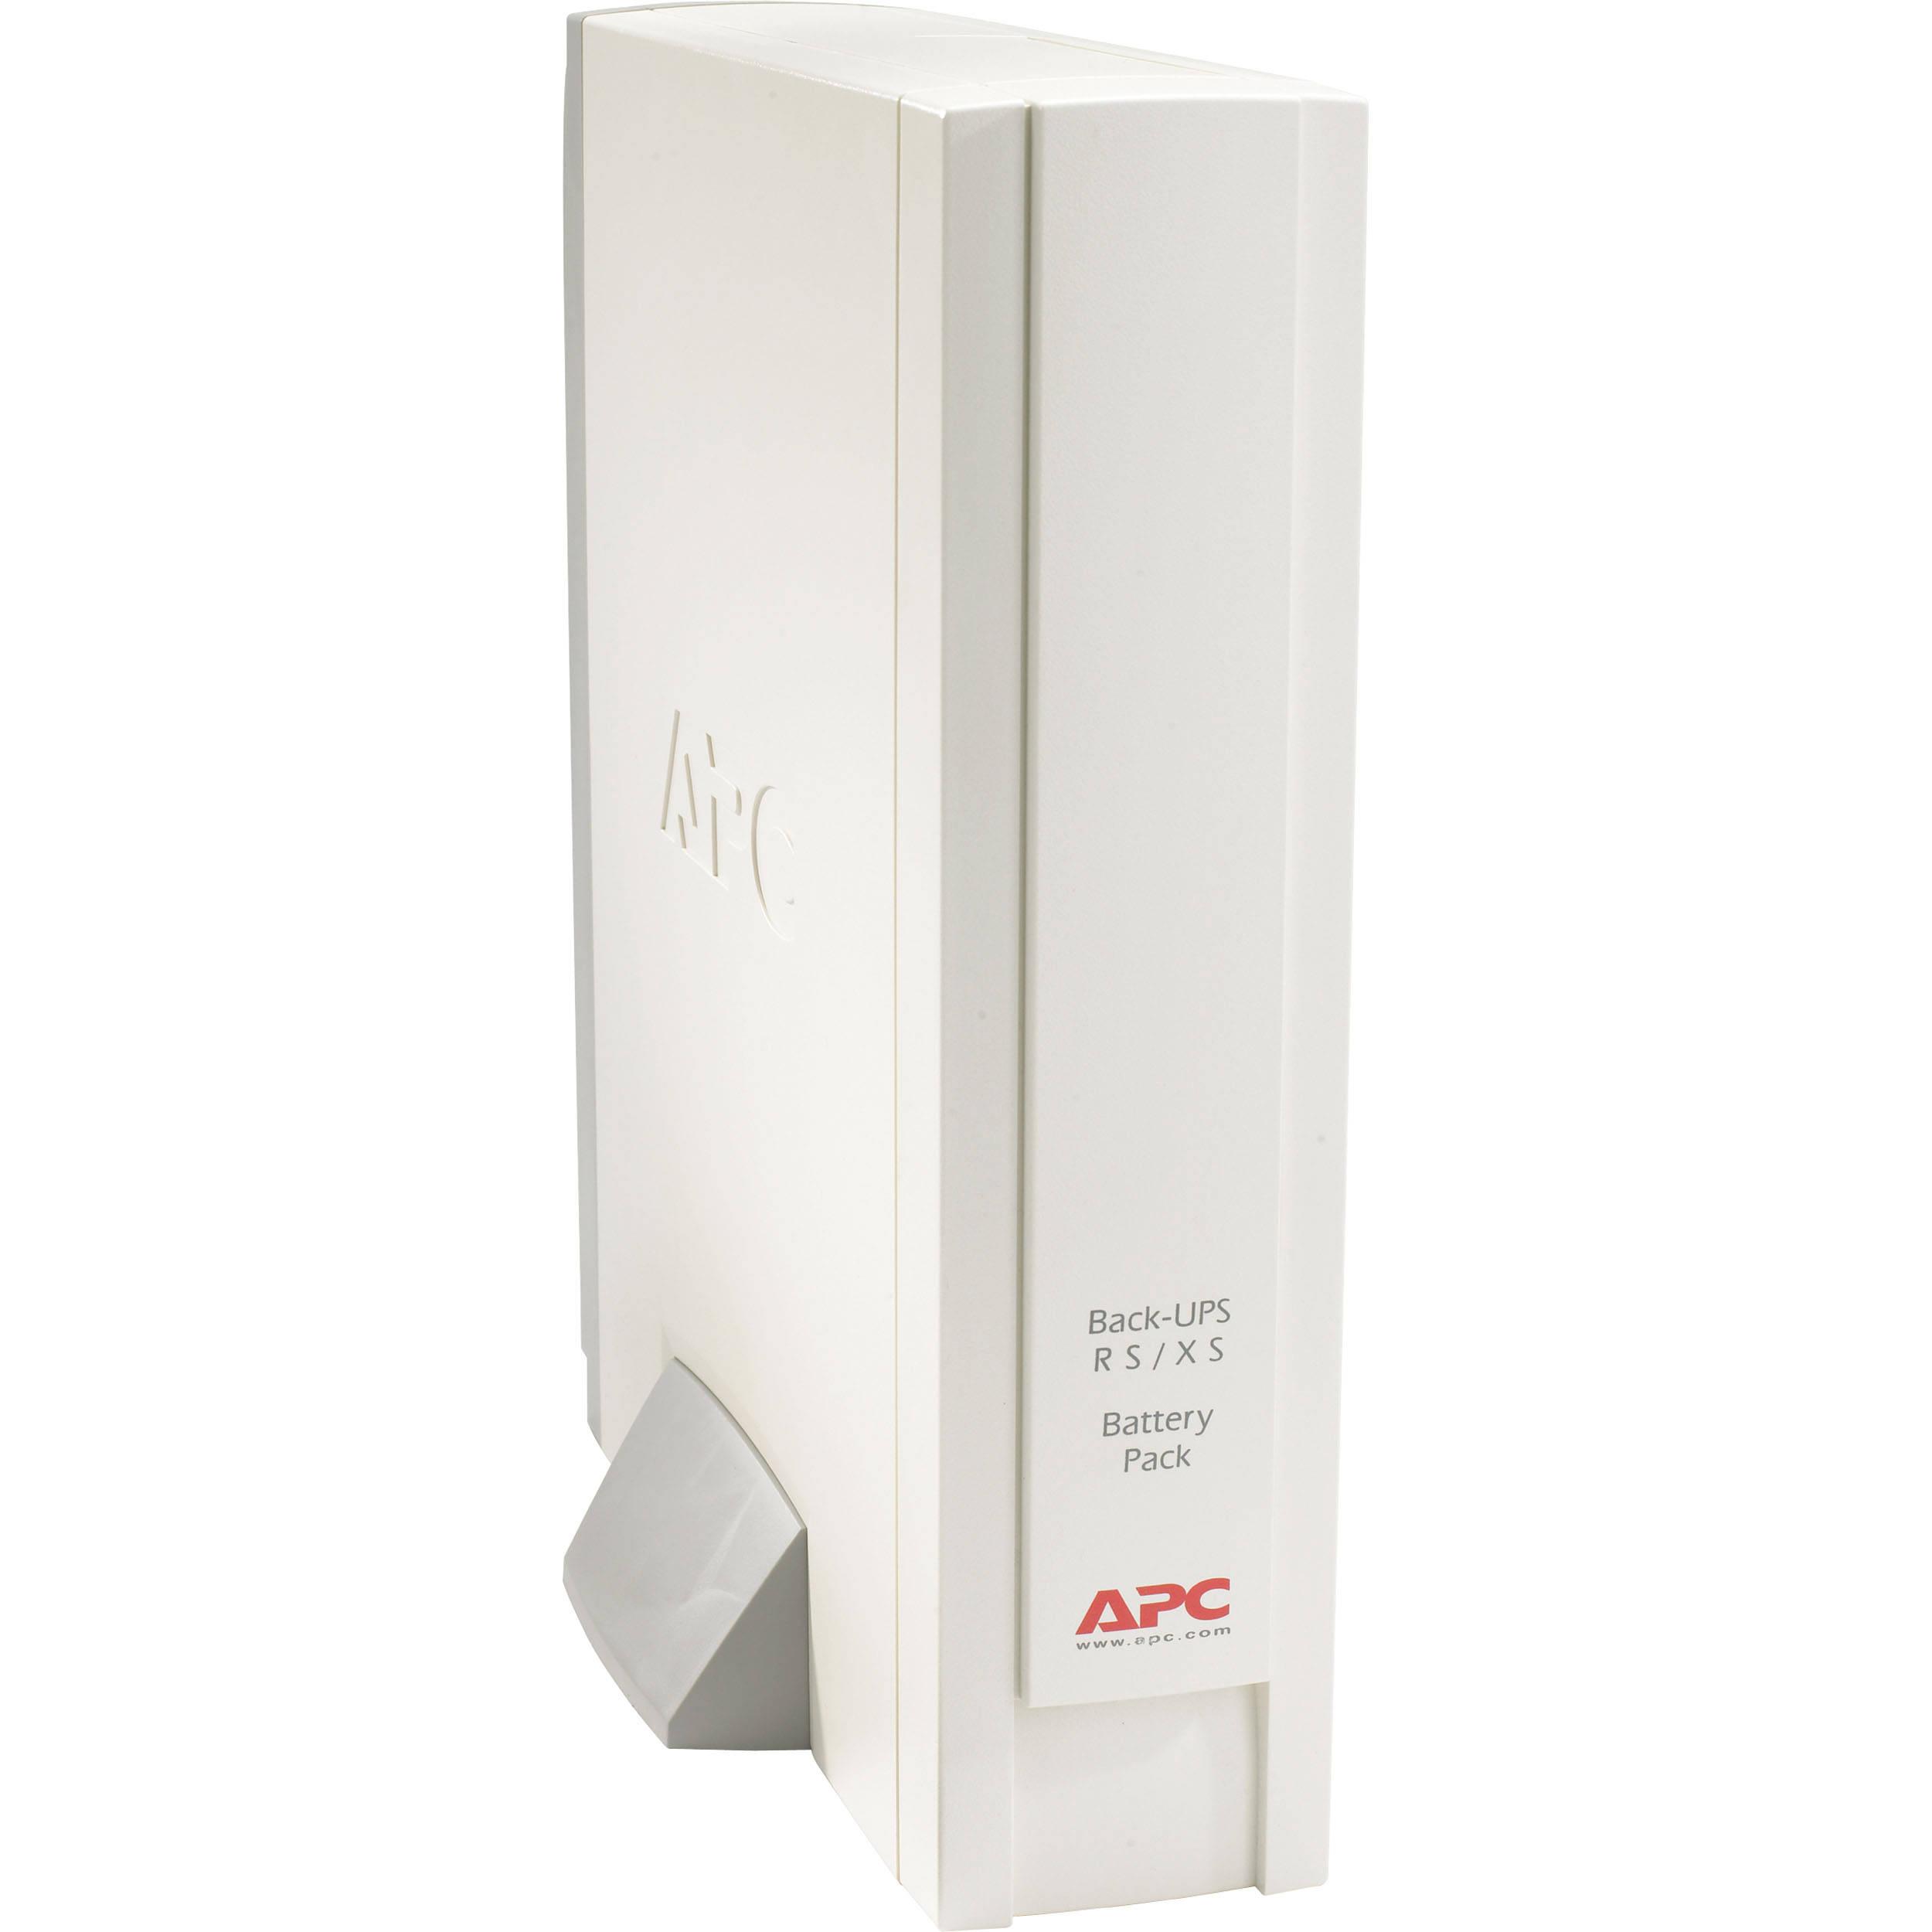 APC Back-UPS RS/XS 1500VA 24V Battery Pack (Beige)